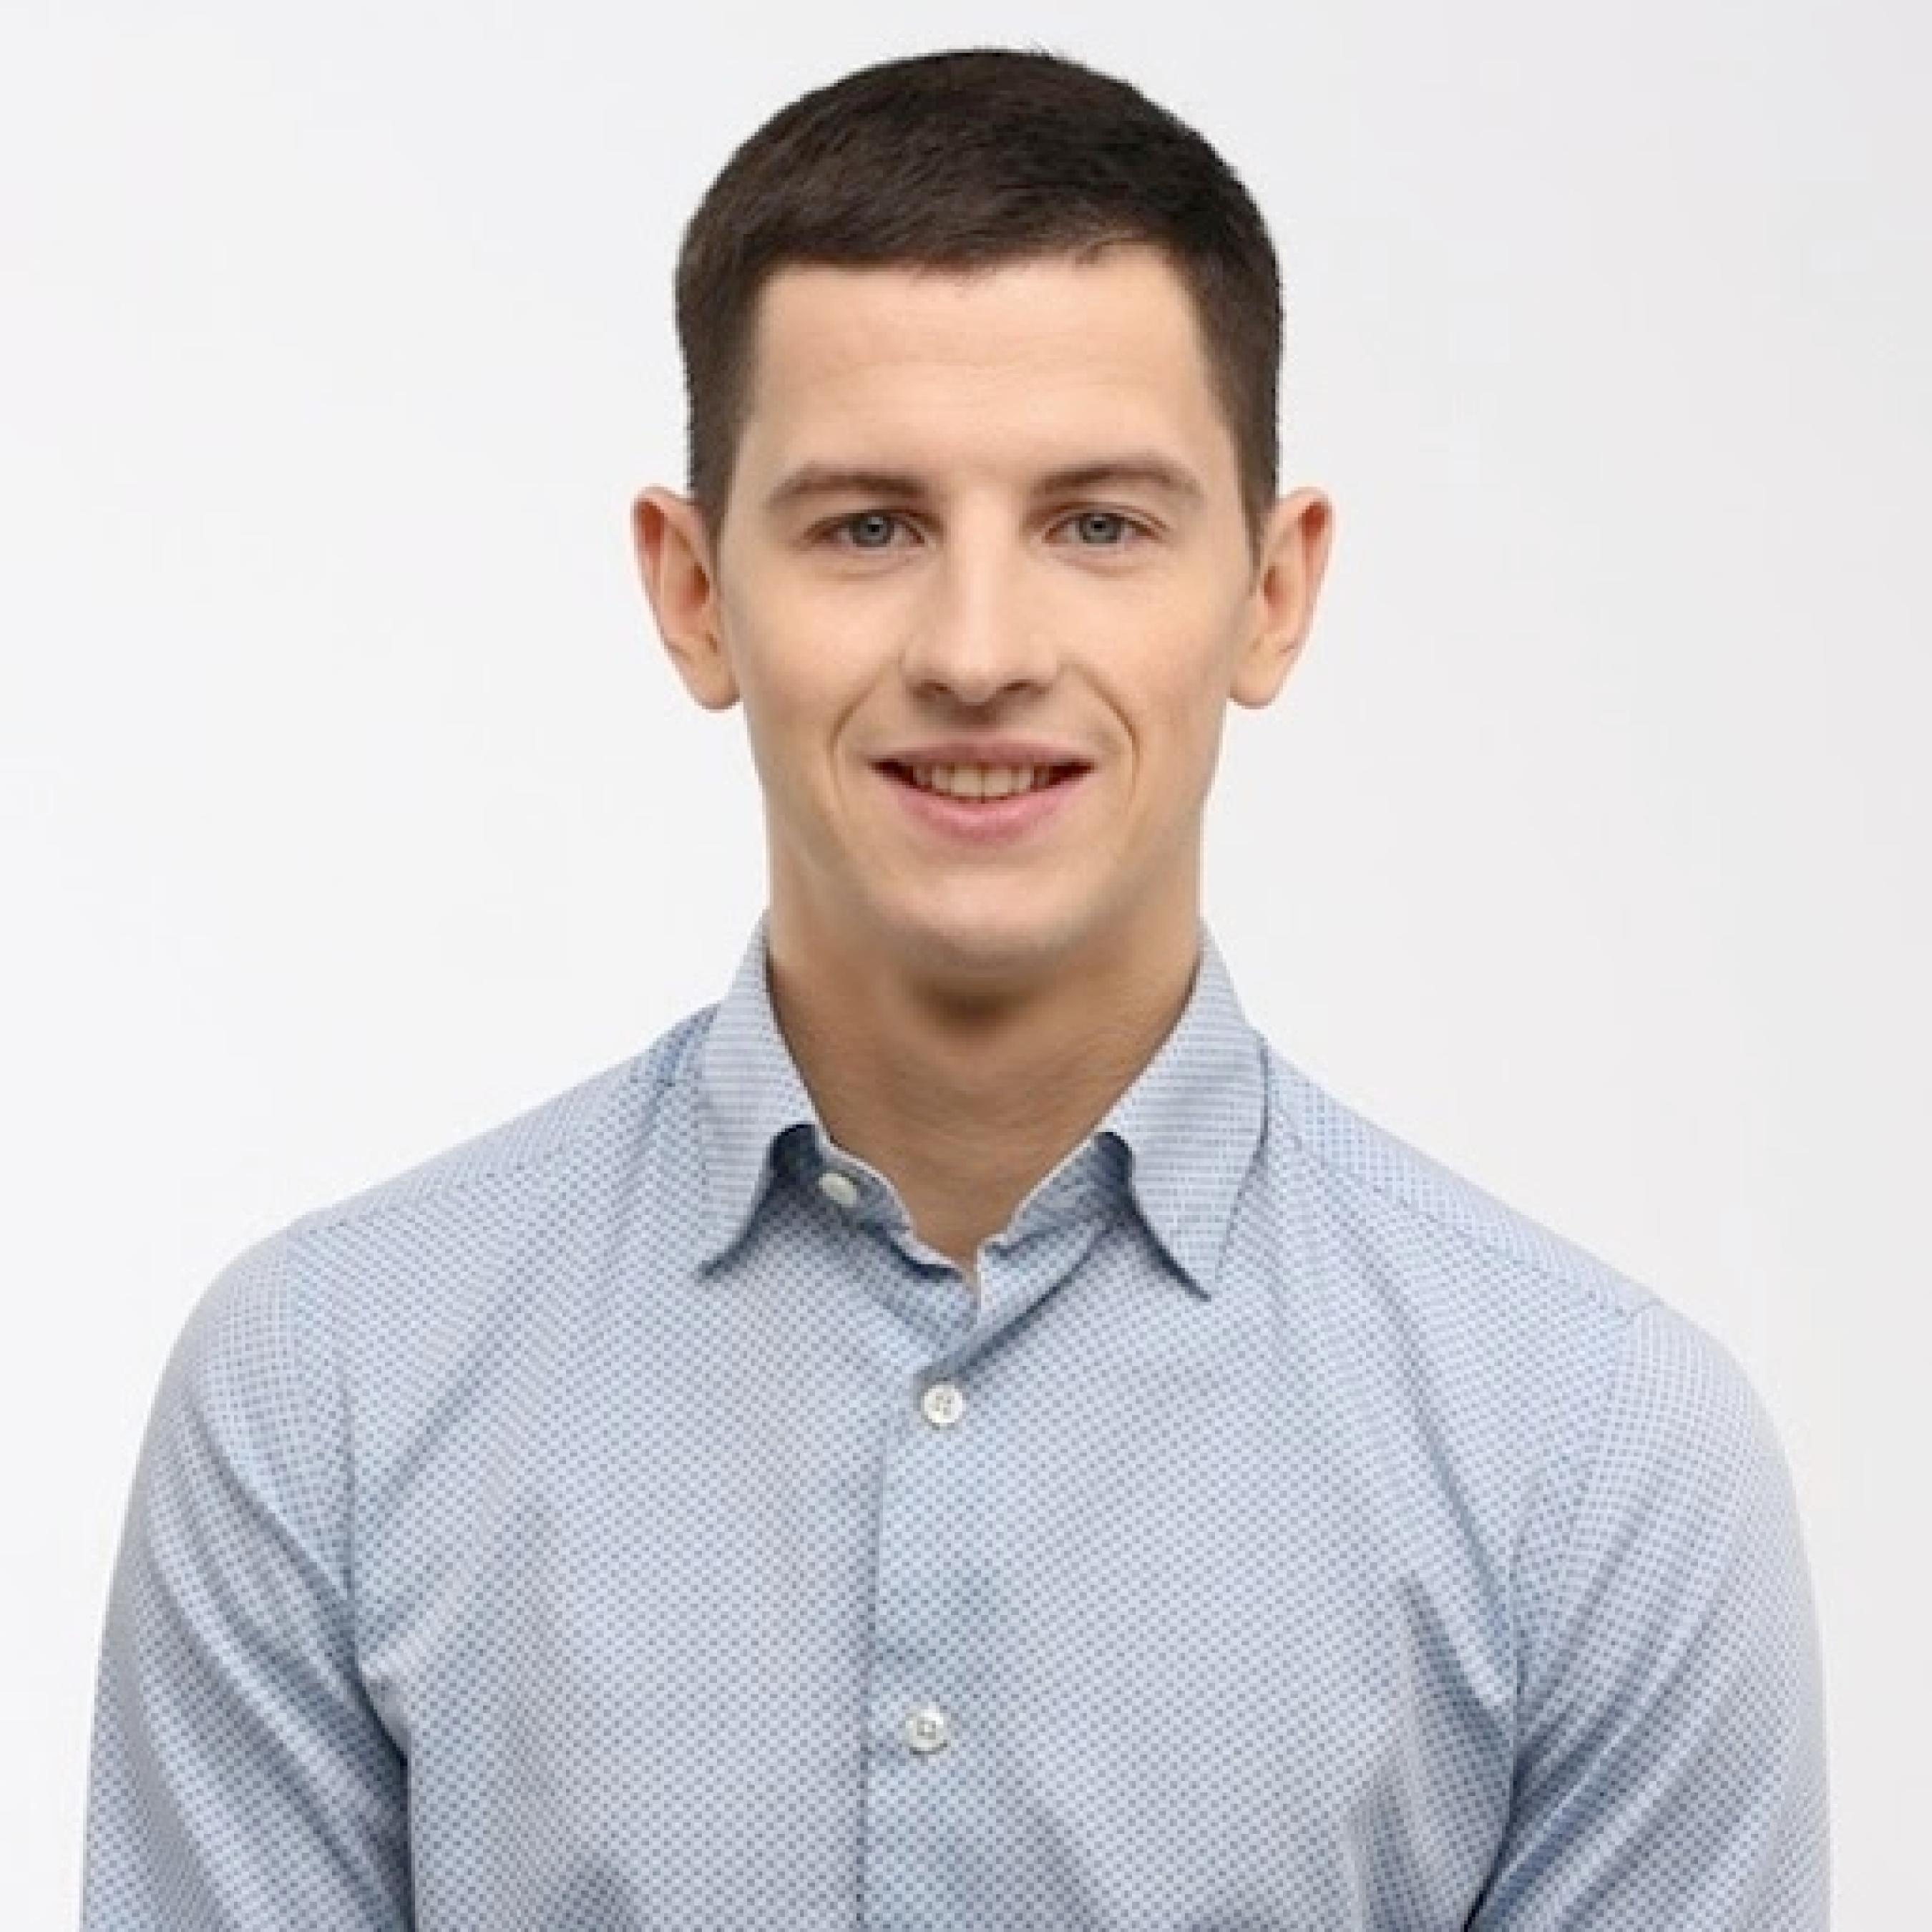 Max Orlov - Account Manager